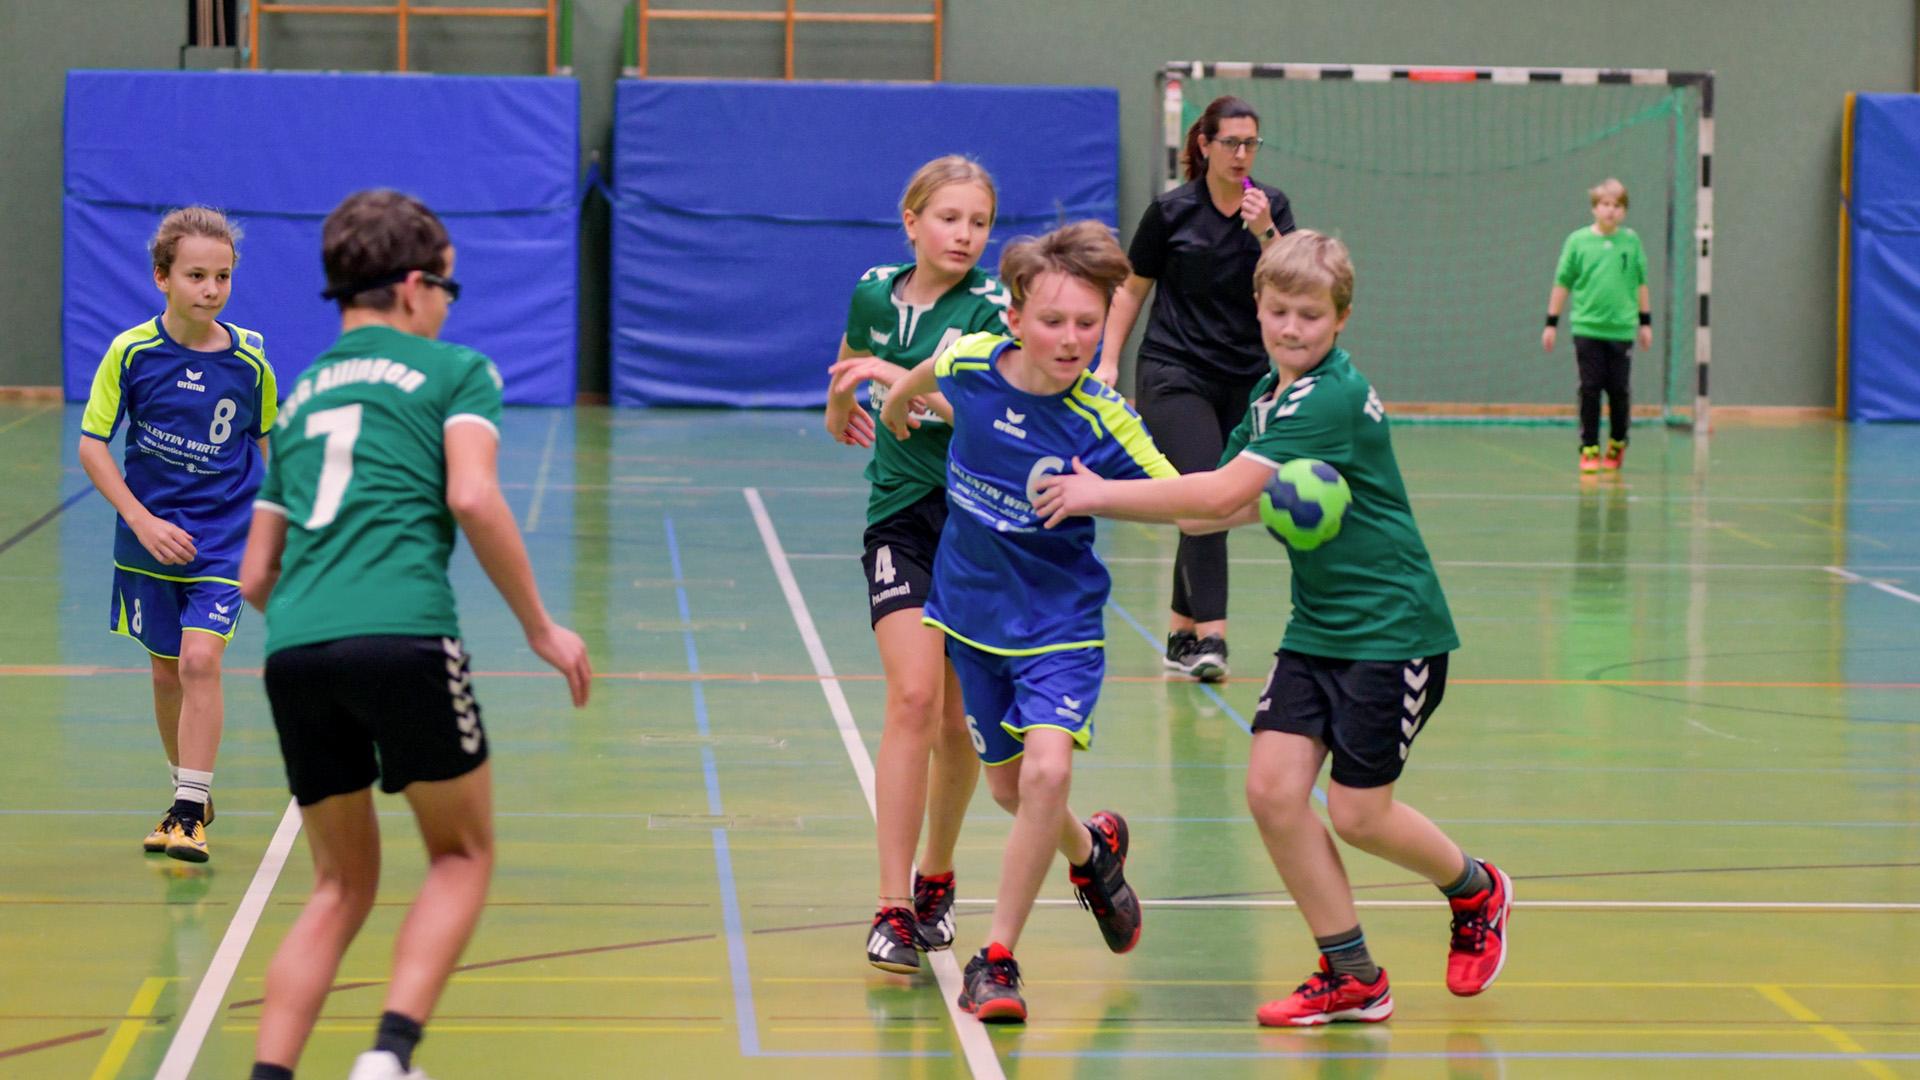 018Slider_mD_tsg_leutkirch_handball